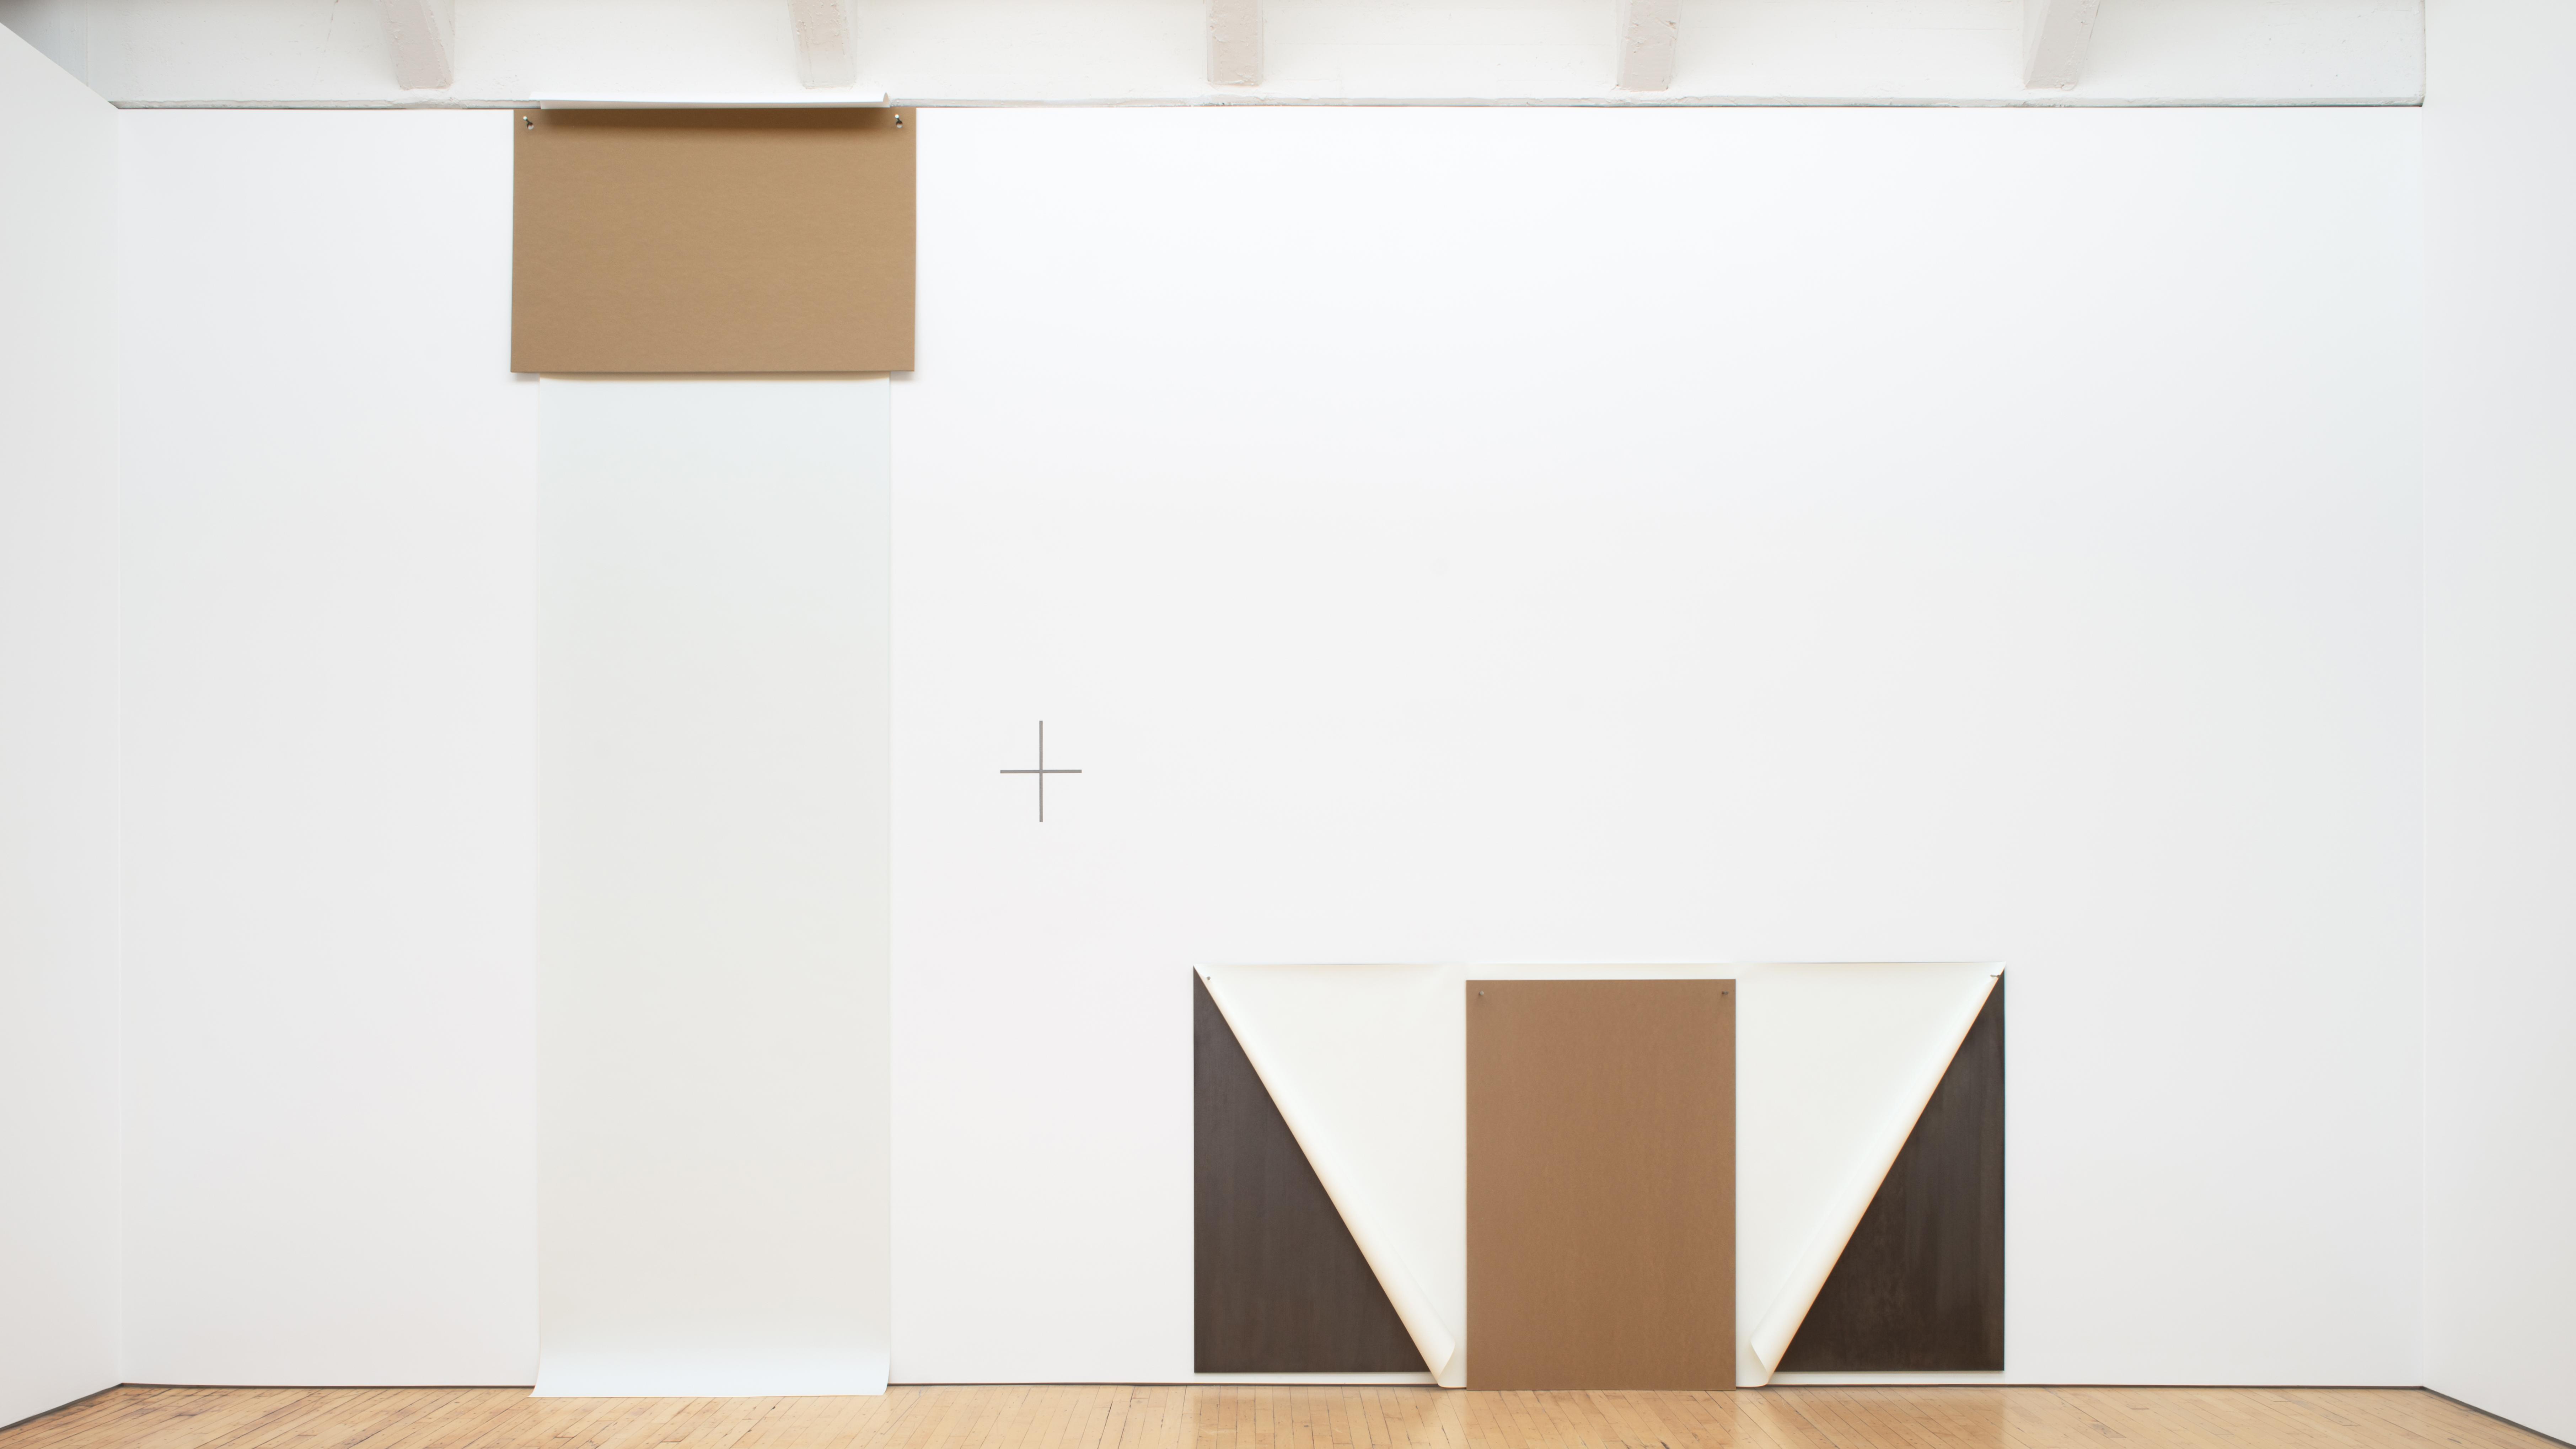 Dorothea Rockburne's exhibition at Dia:Beacon